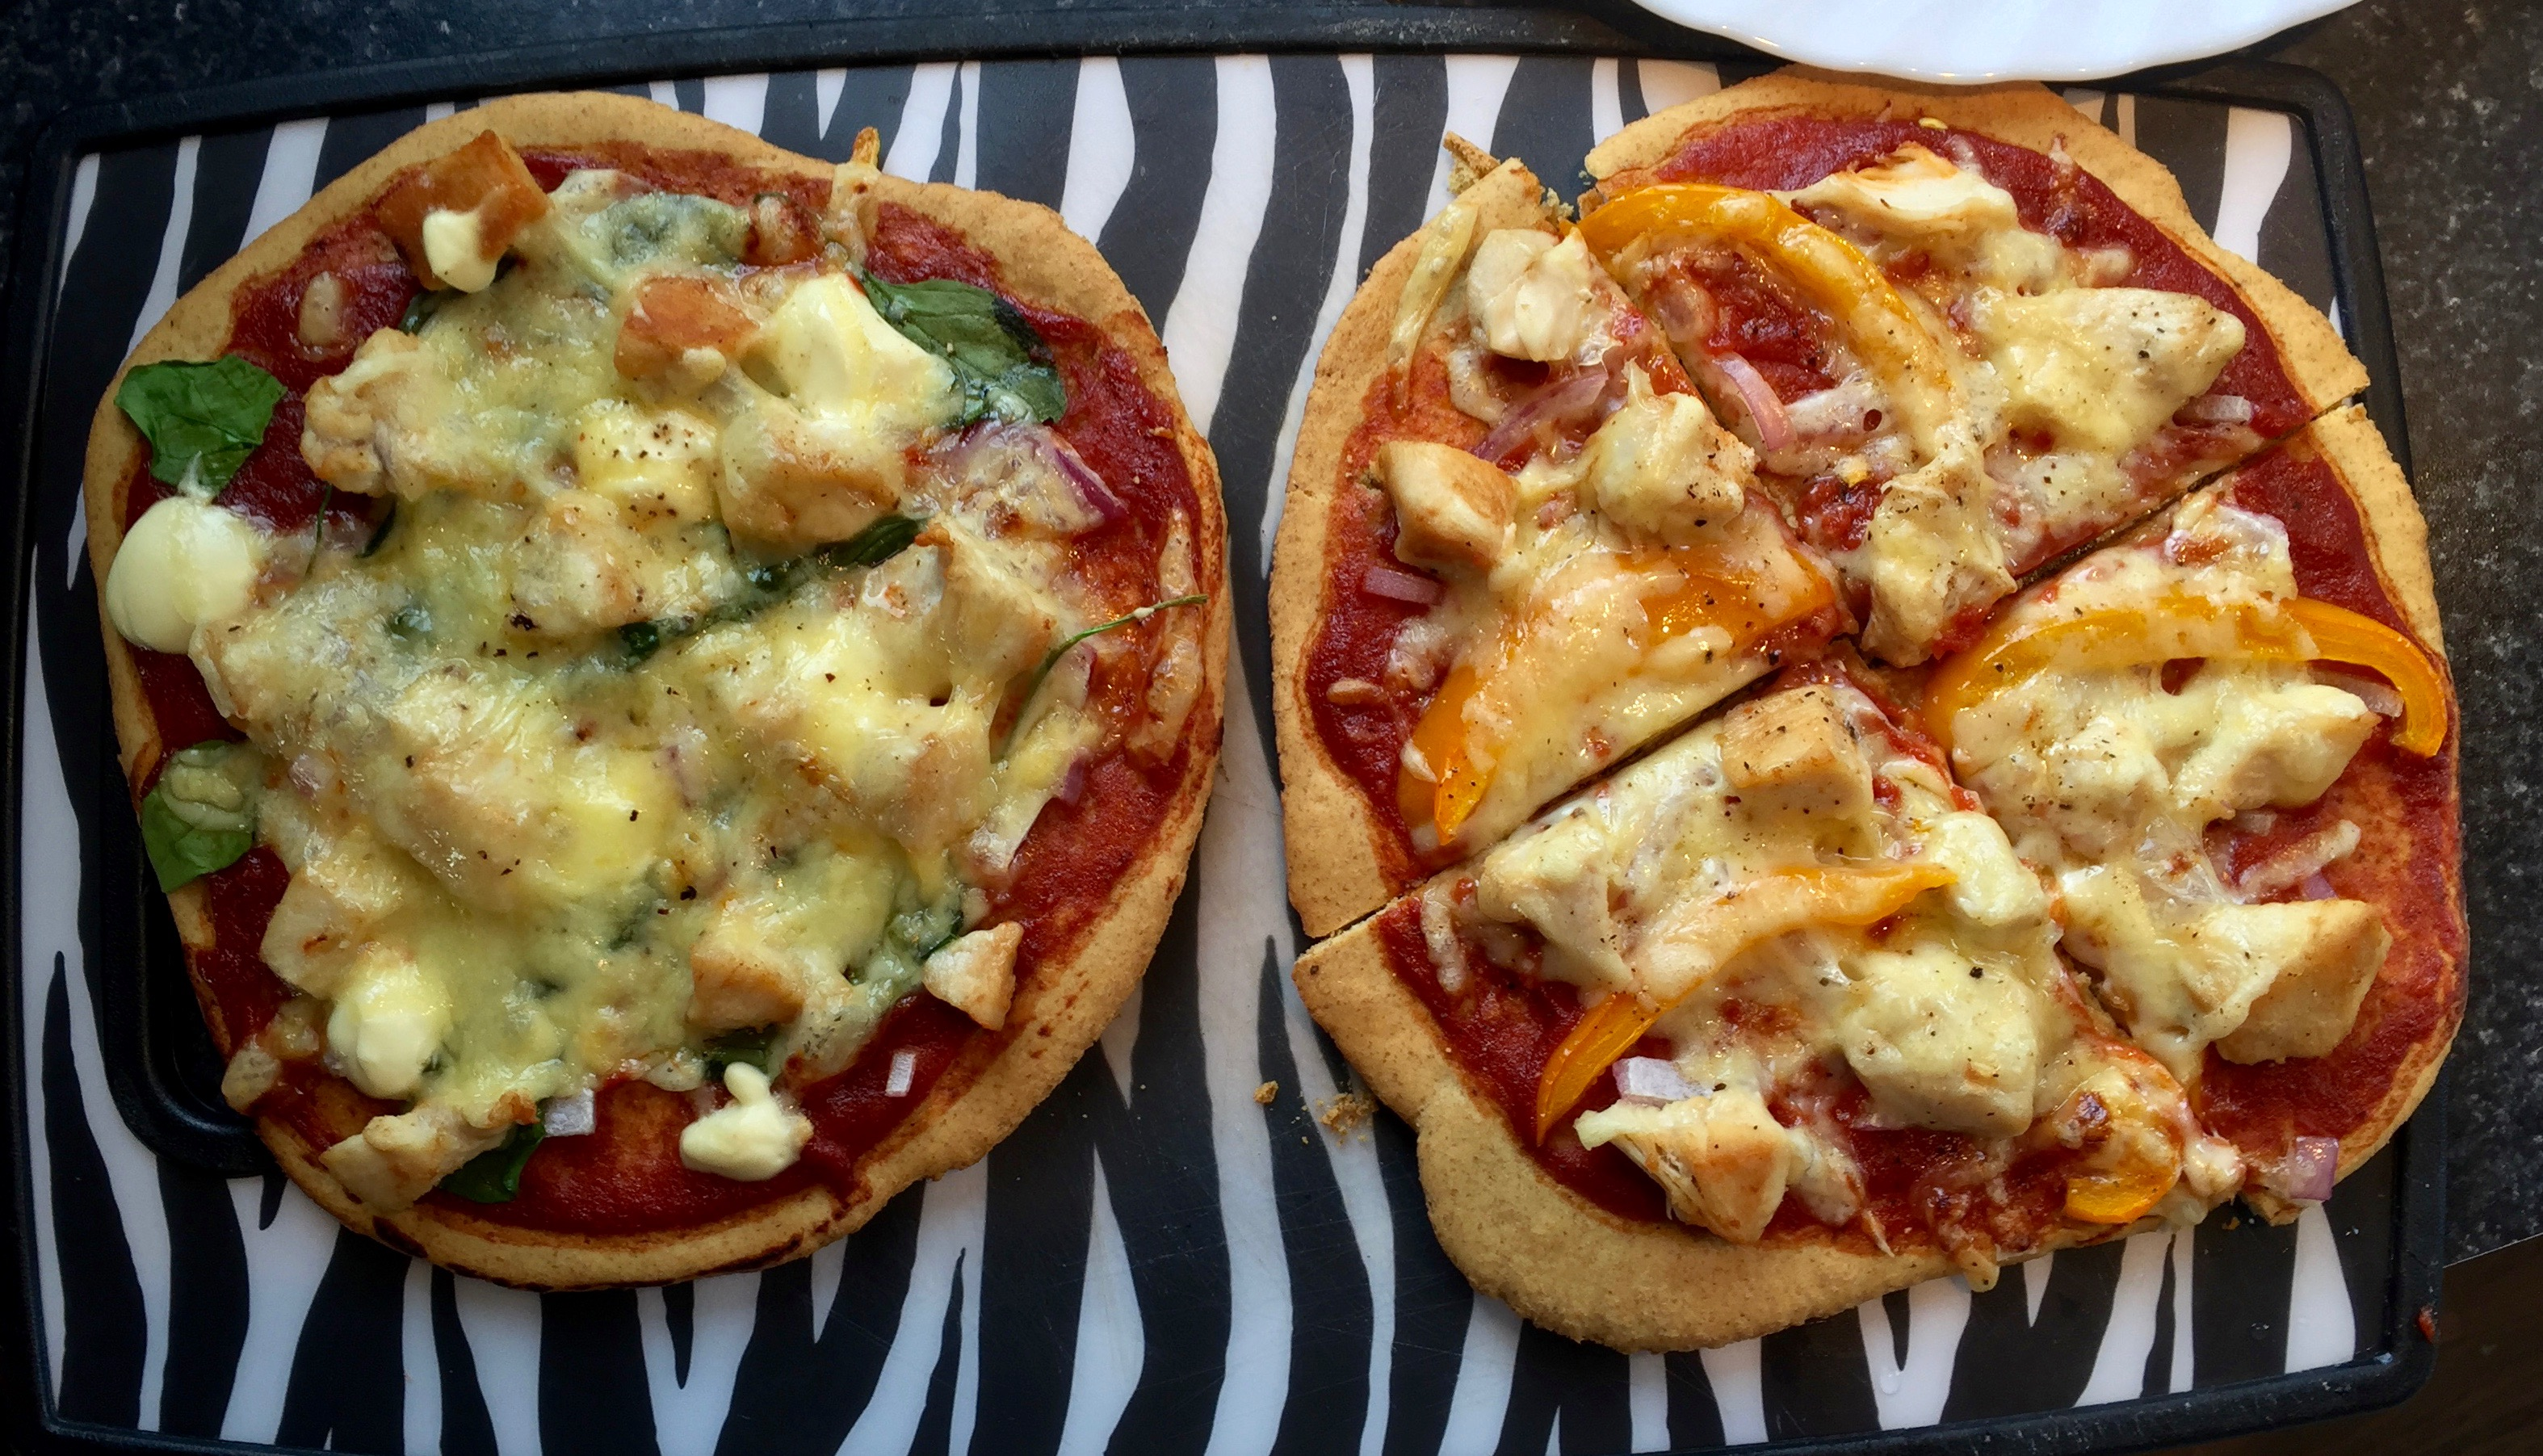 High Quality Petite Kitchen Pizzau0027s. U201c